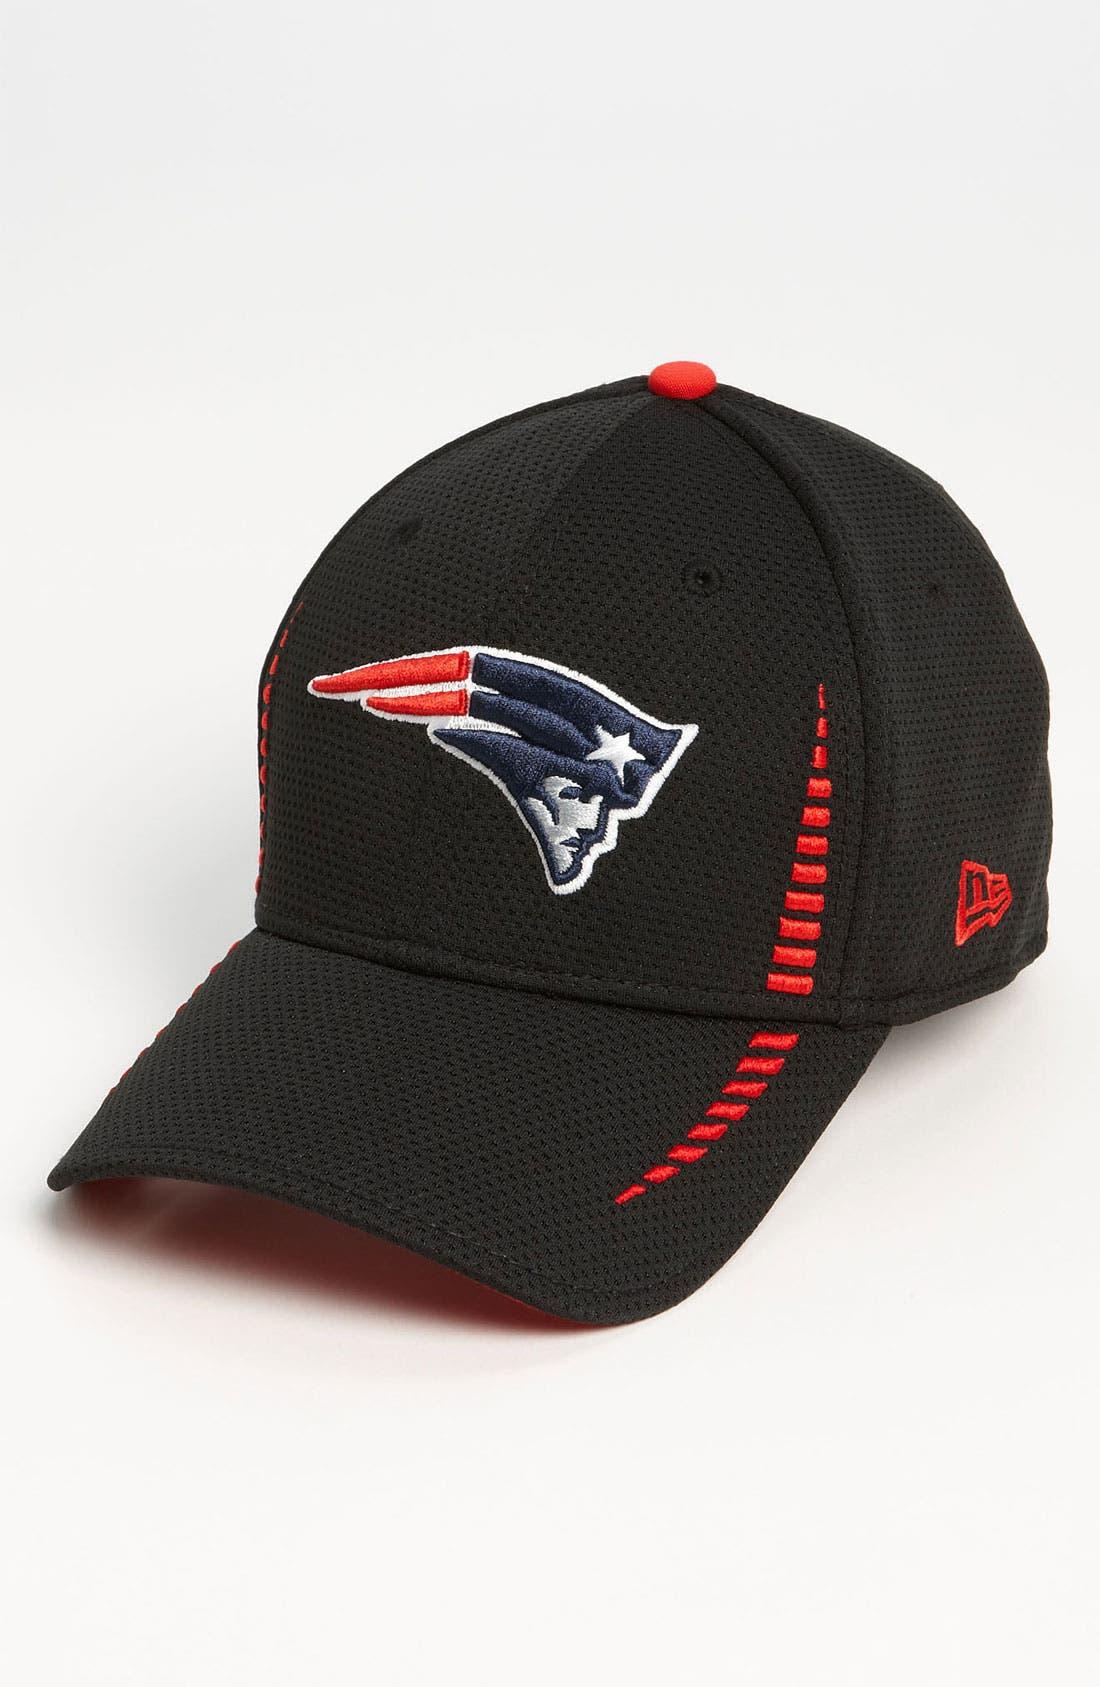 Main Image - New Era Cap 'Training Camp - New England Patriots' Baseball Cap